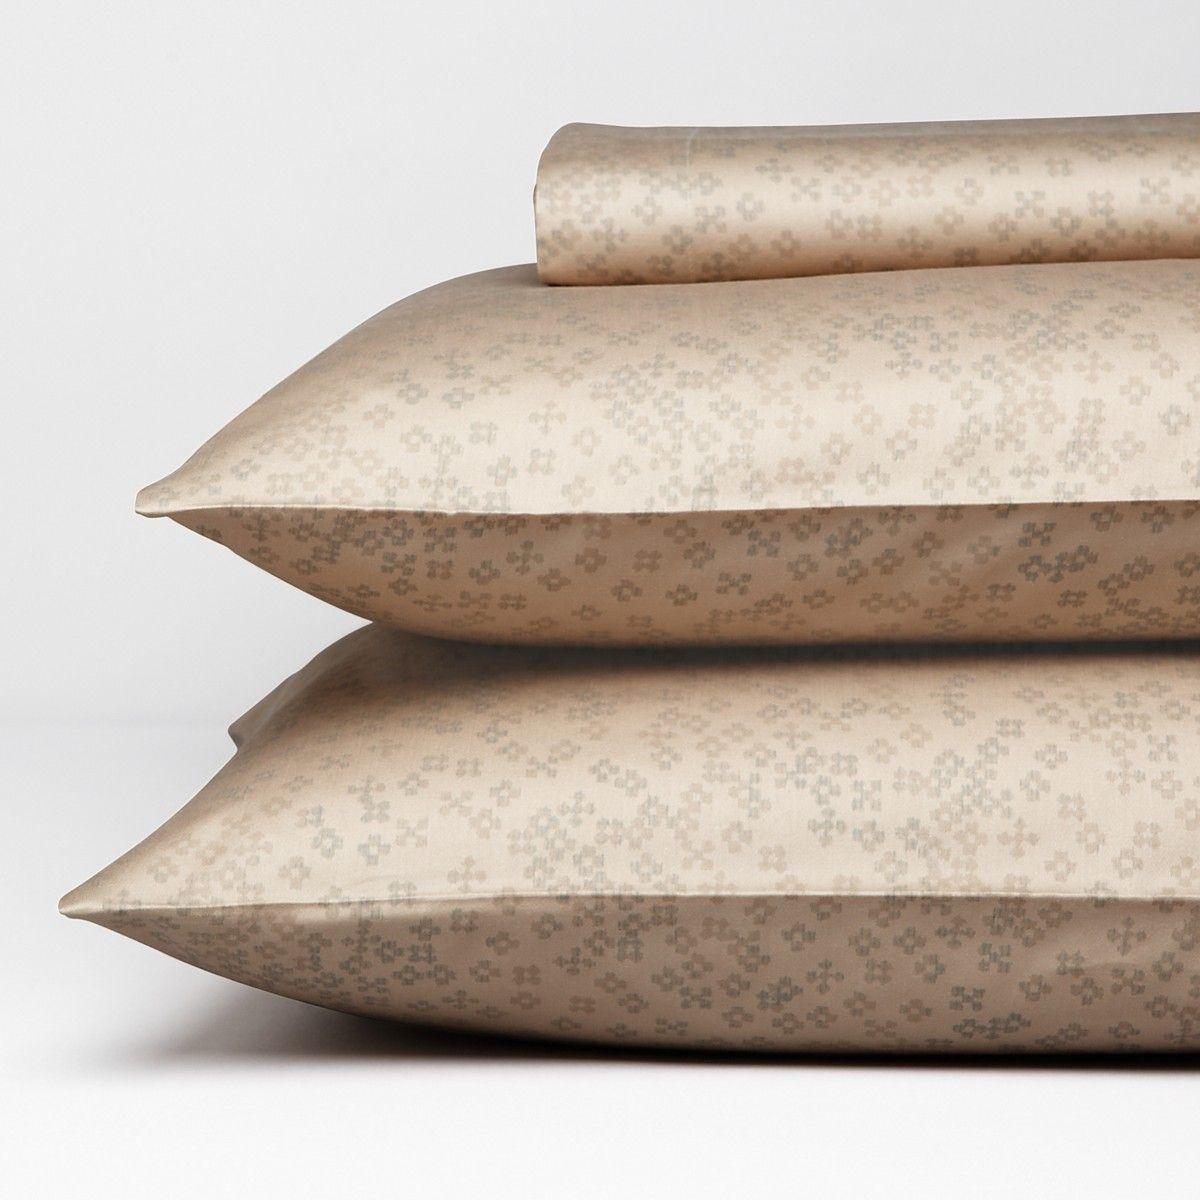 Calvin Klein Marin Mosaic Sheet Set, Queen #Sheet #Home #BedBath